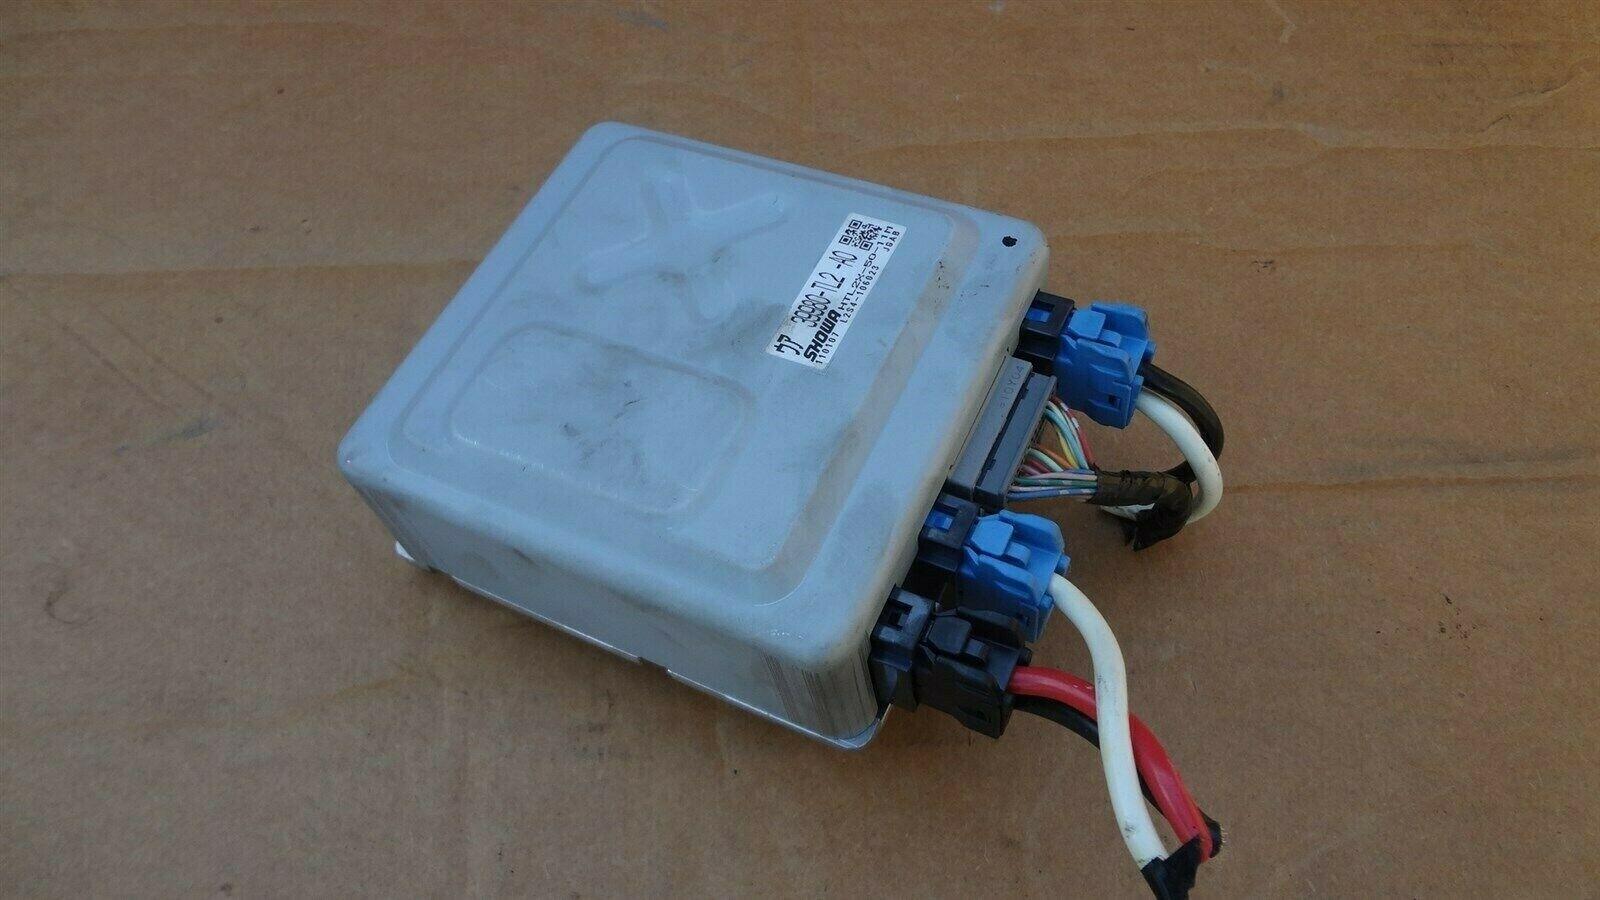 06 Highlander Hybrid Electric Steering Control Computer EPS Module 89650-48010